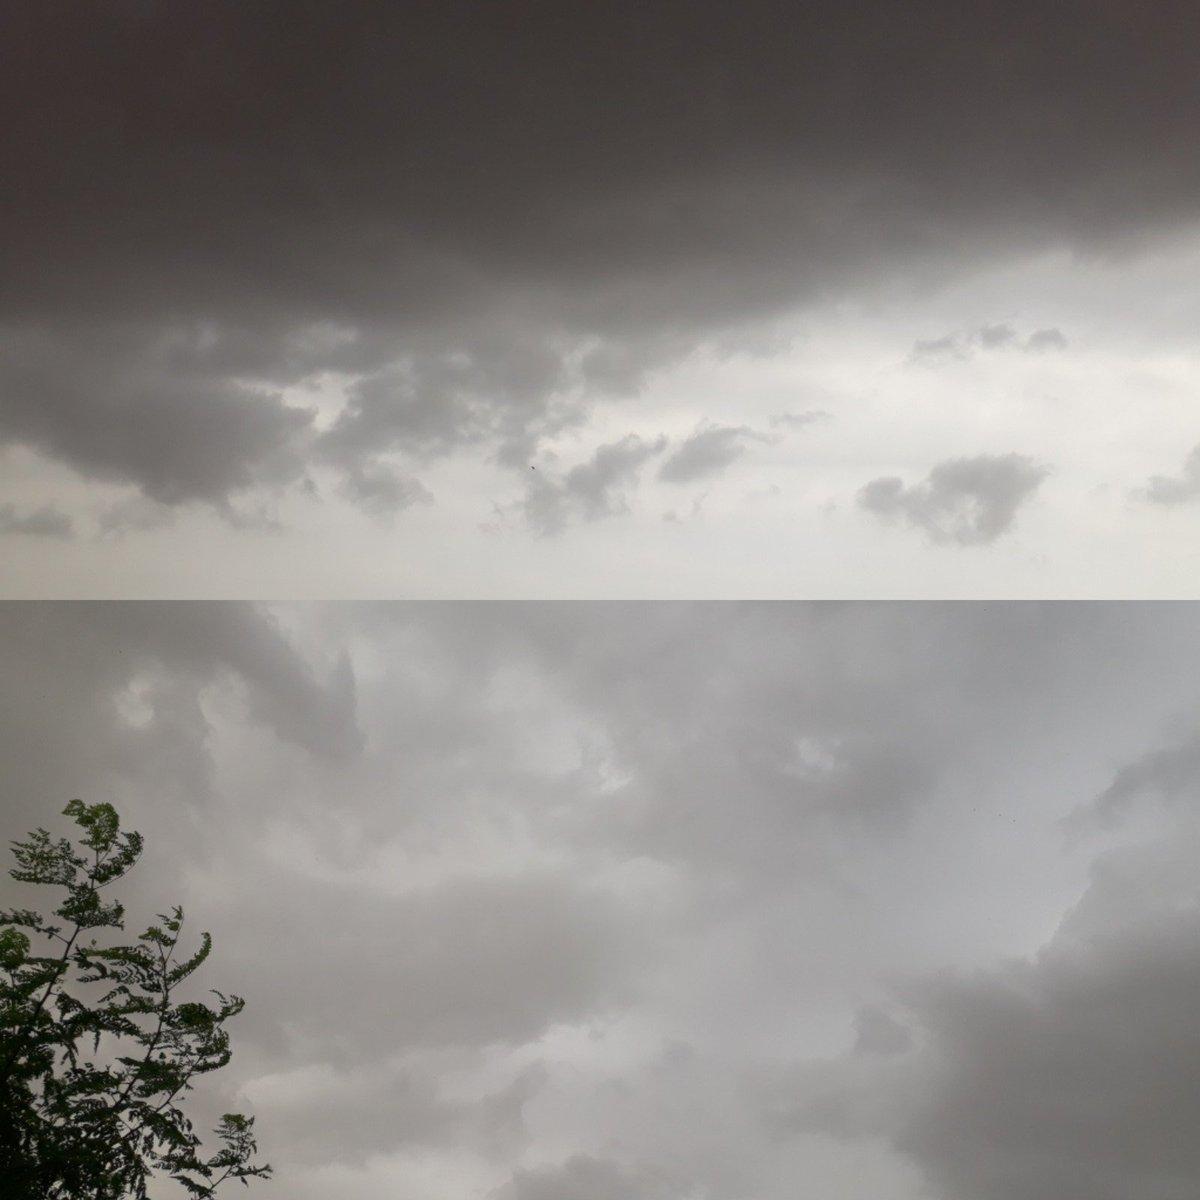 #Karachi #Weather ri8 know #Cloud 🌫